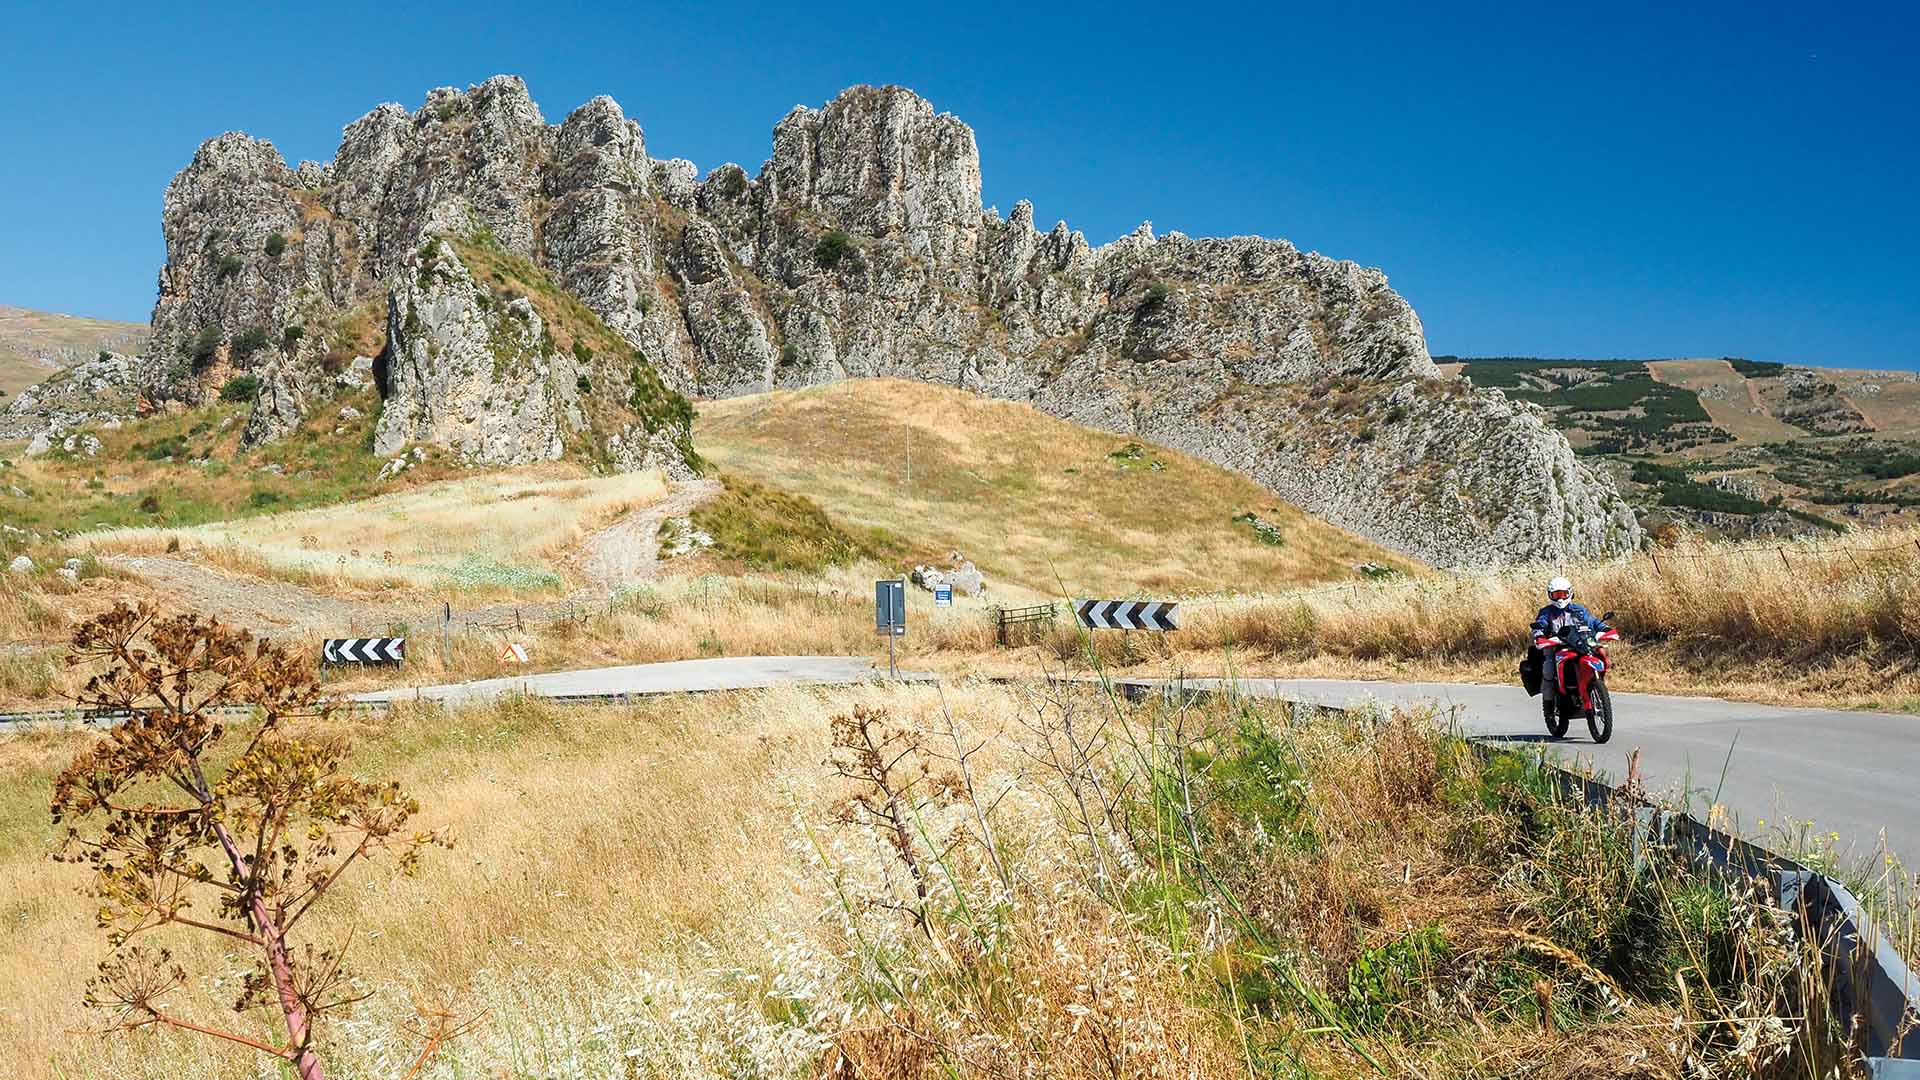 Cannoli siciliani, Tour 2 (Tour Madonie)